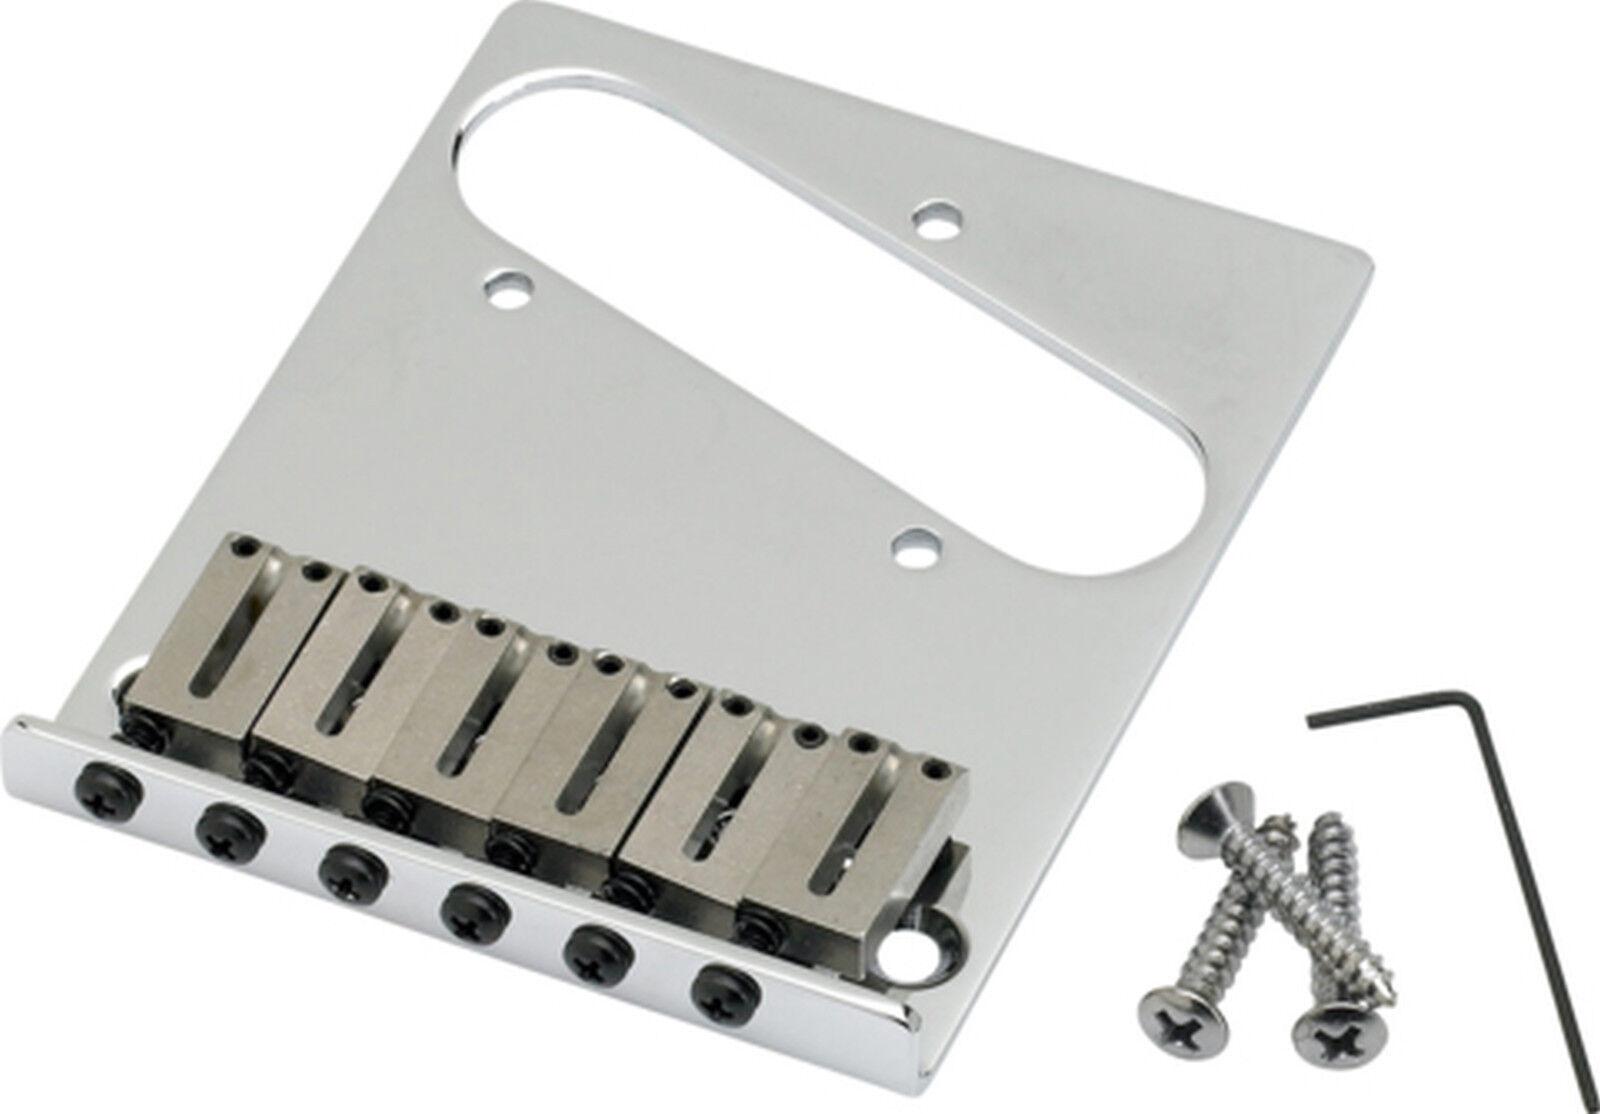 Fender 6-Saddle American Series Telecaster Bridge Assembly (Chrome) 0990807100